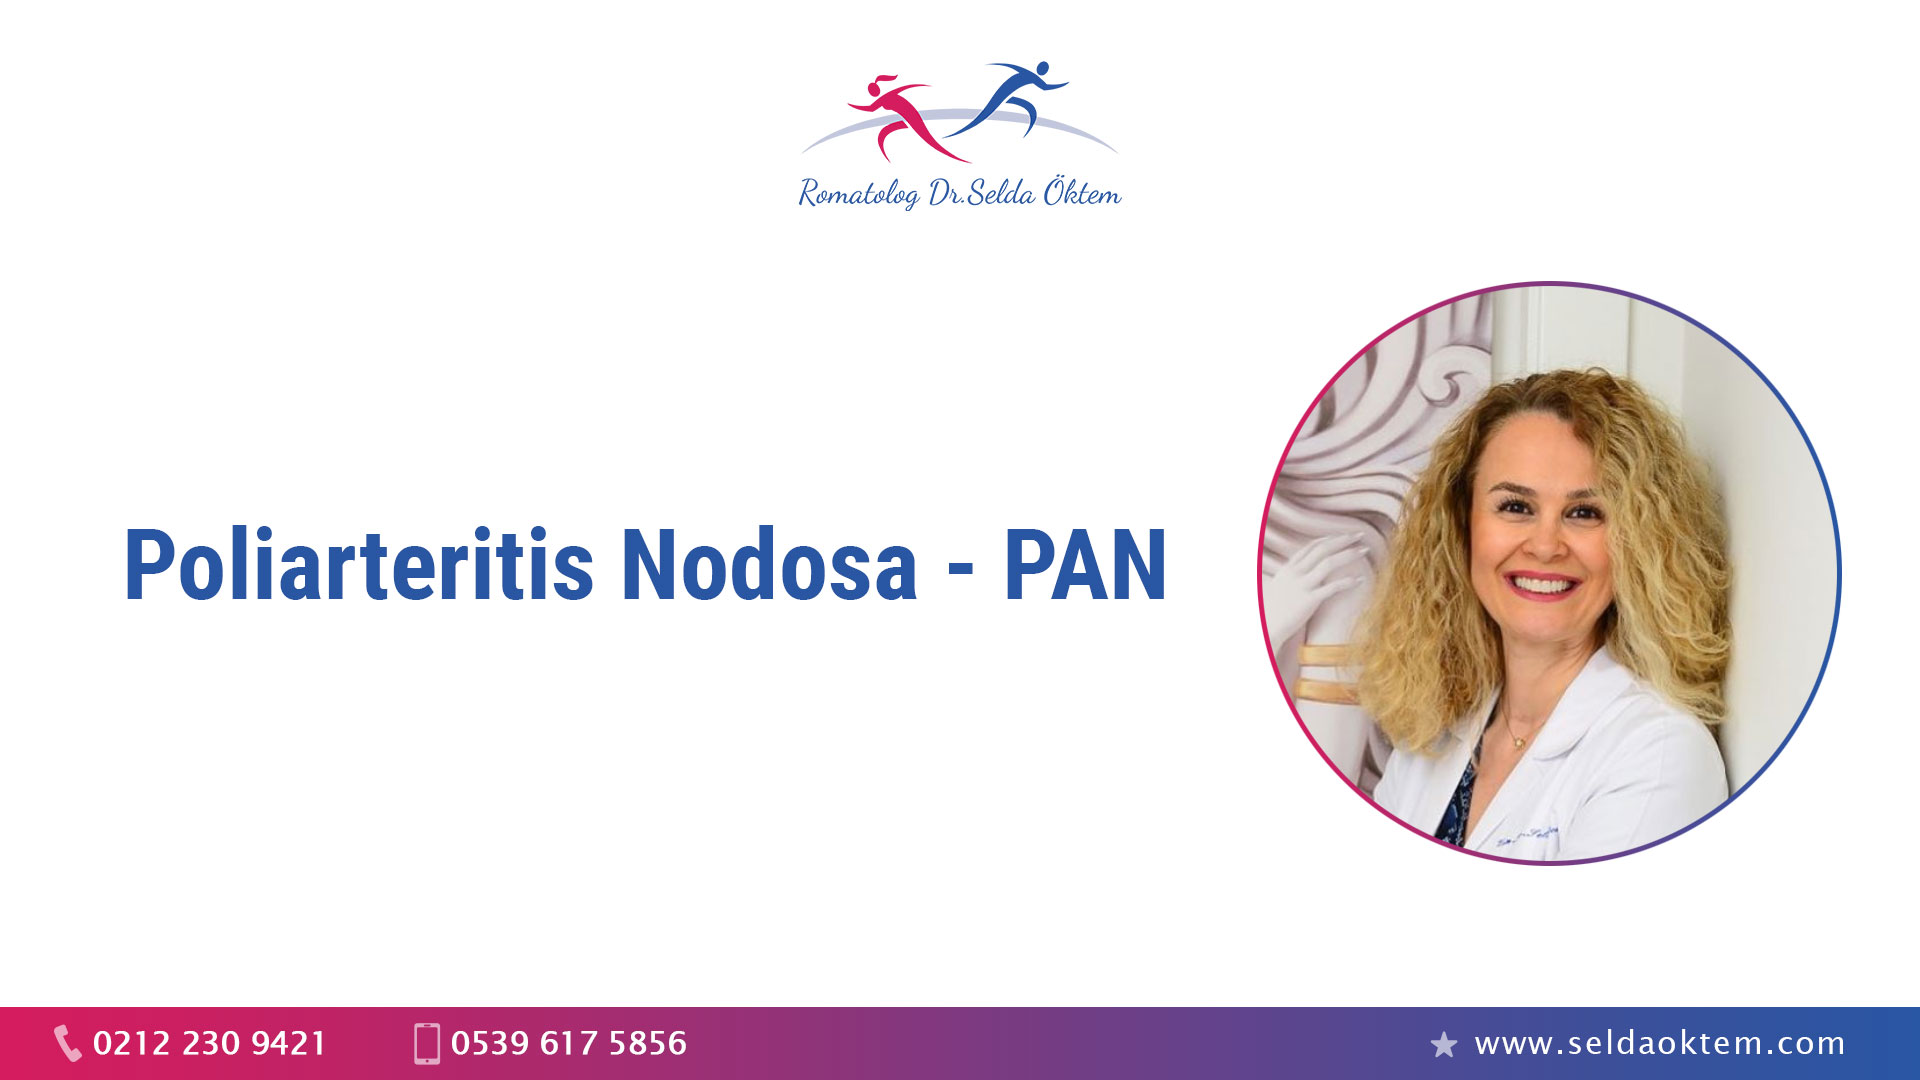 Poliarteritis Nodosa - PAN